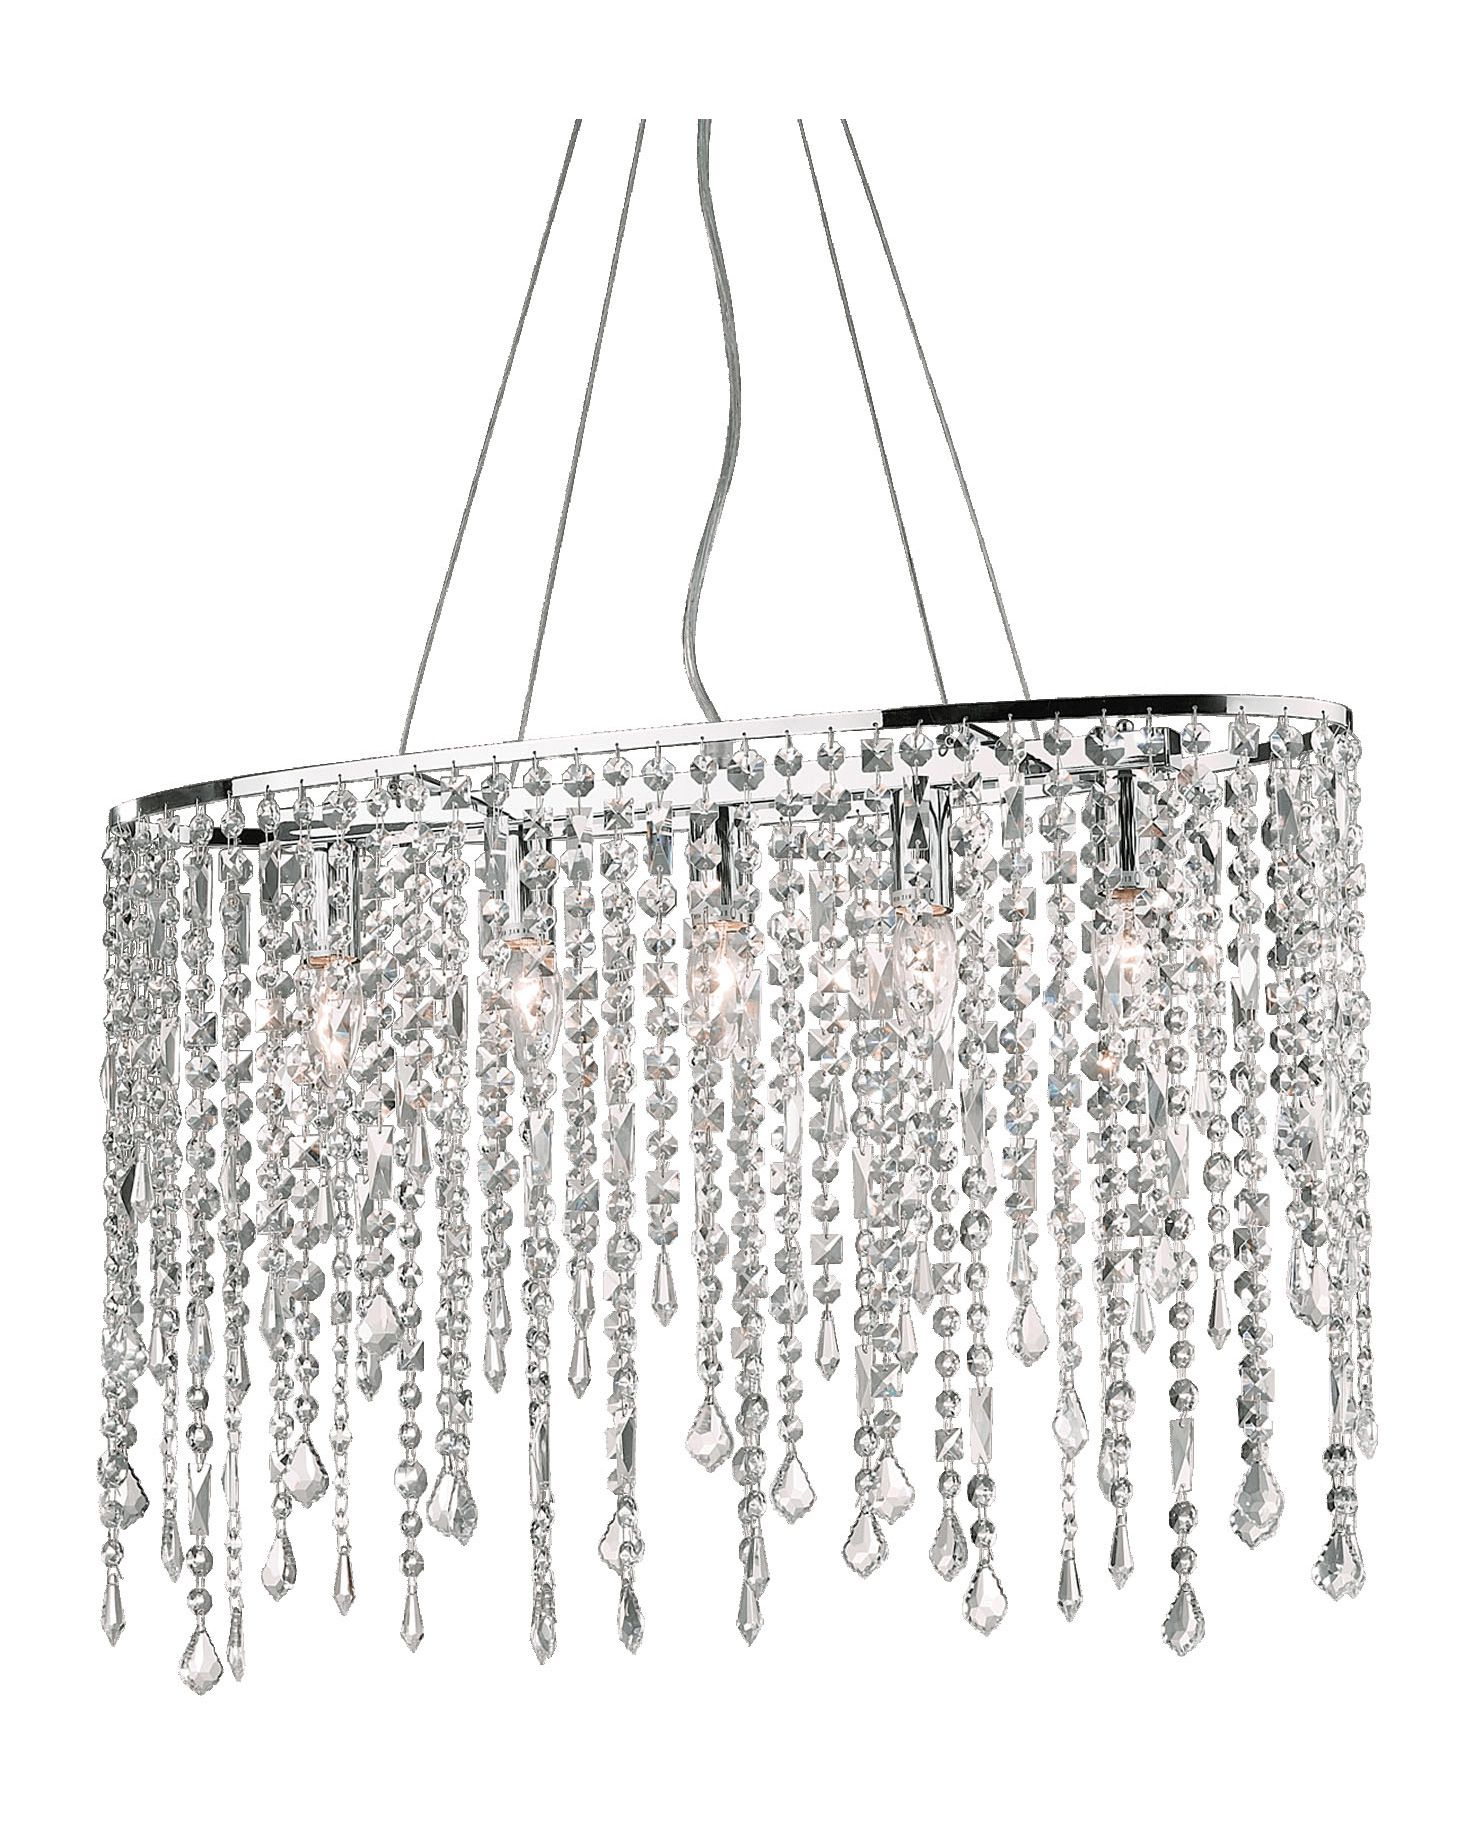 Rain de Lámparas Sp5 Ideal de techo Clear Lux doeBWrCx